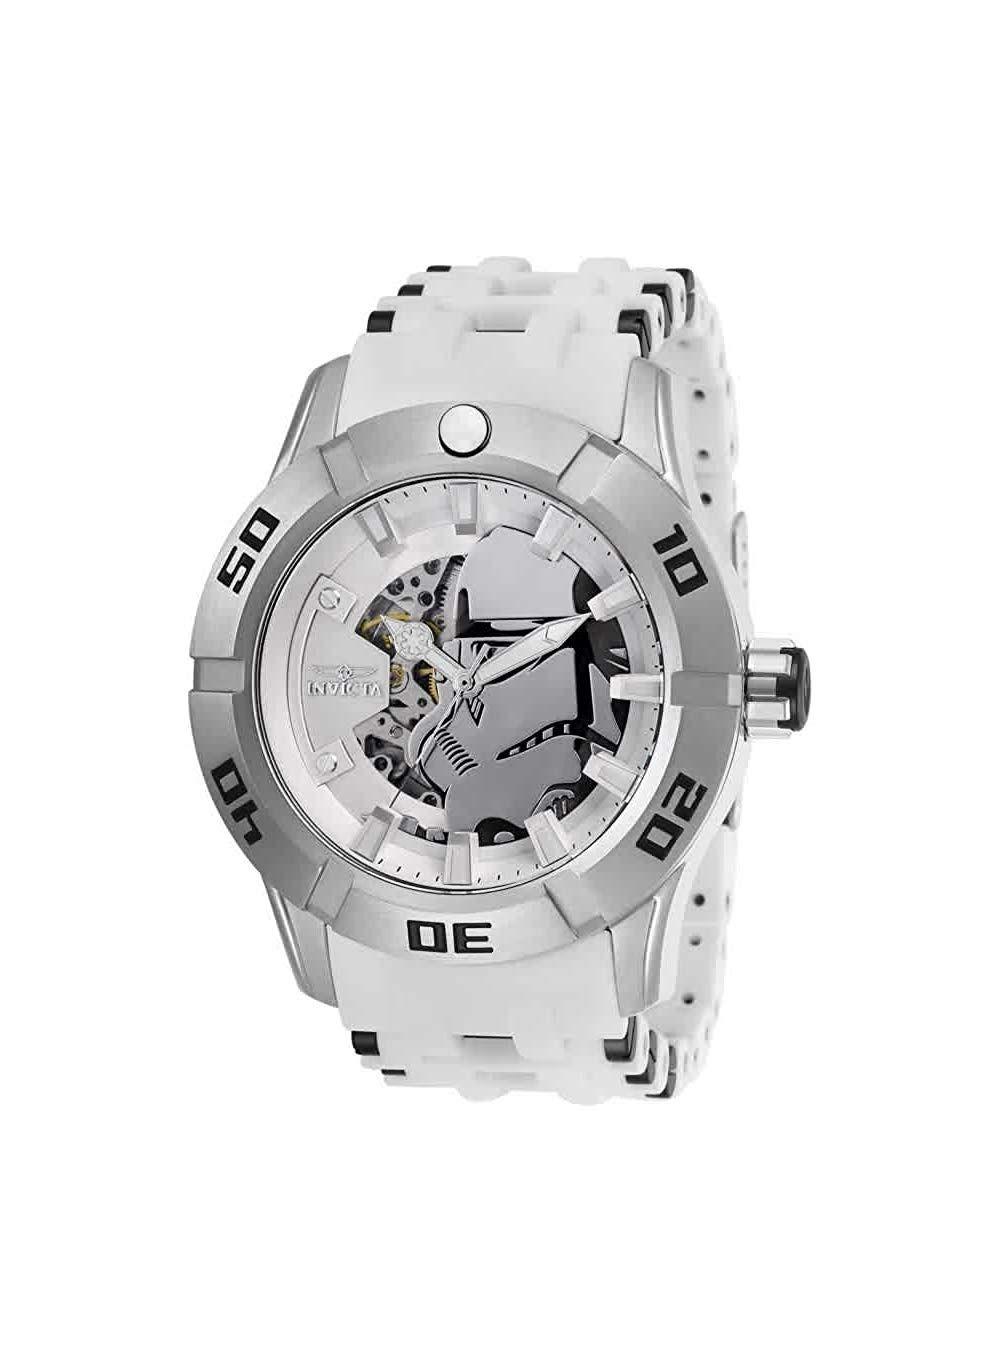 Amazon: Invicta Star Wars Automatic White Dial Men's Watch 26554